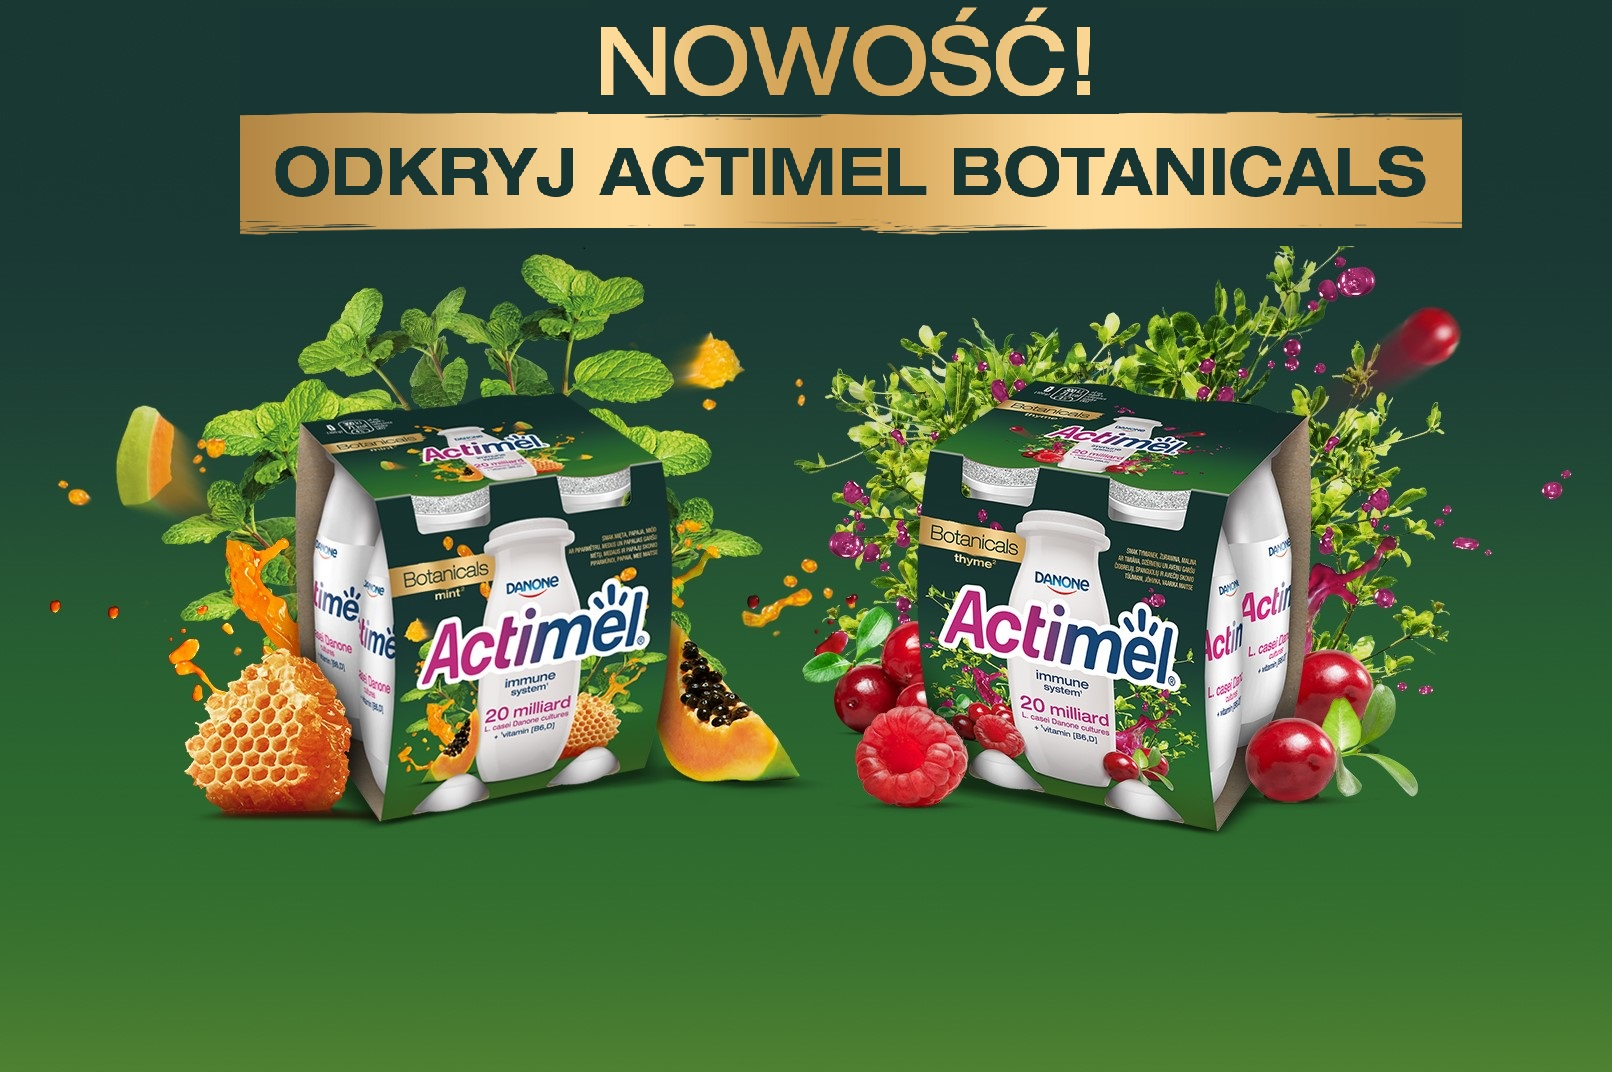 Actimel Botanicals